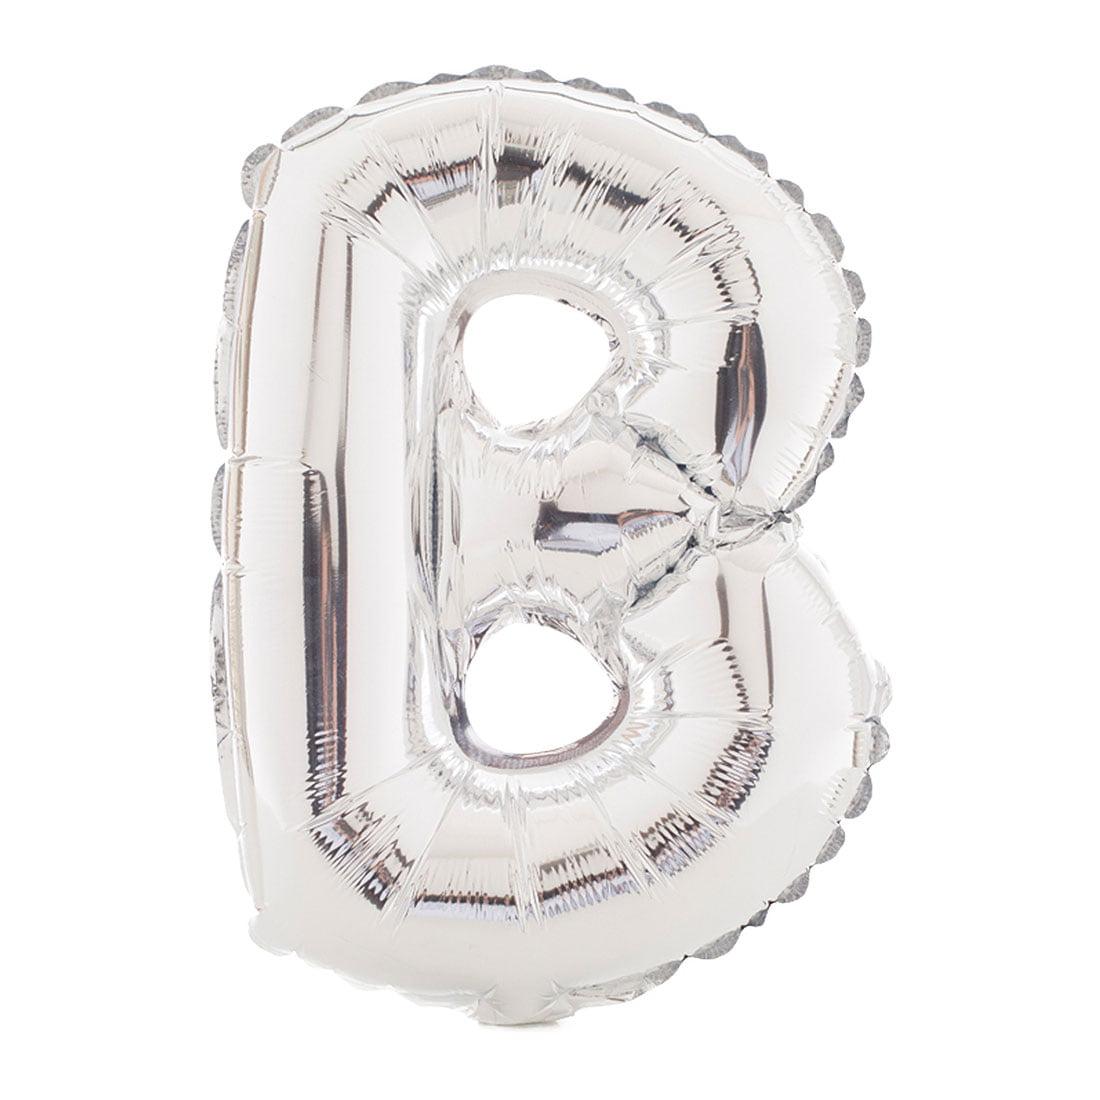 "Unique Bargains 40"" Silver Tone Letter B Balloon Helium Birthday Wedding Festival Decor"